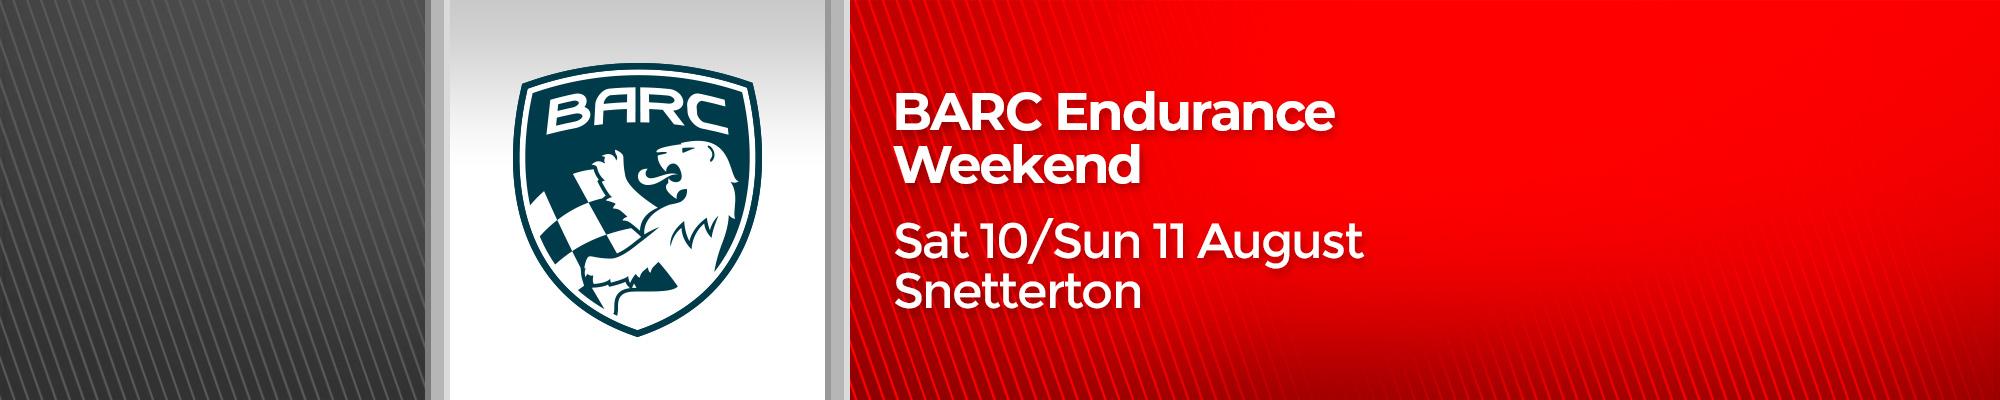 BARC Endurance Weekend